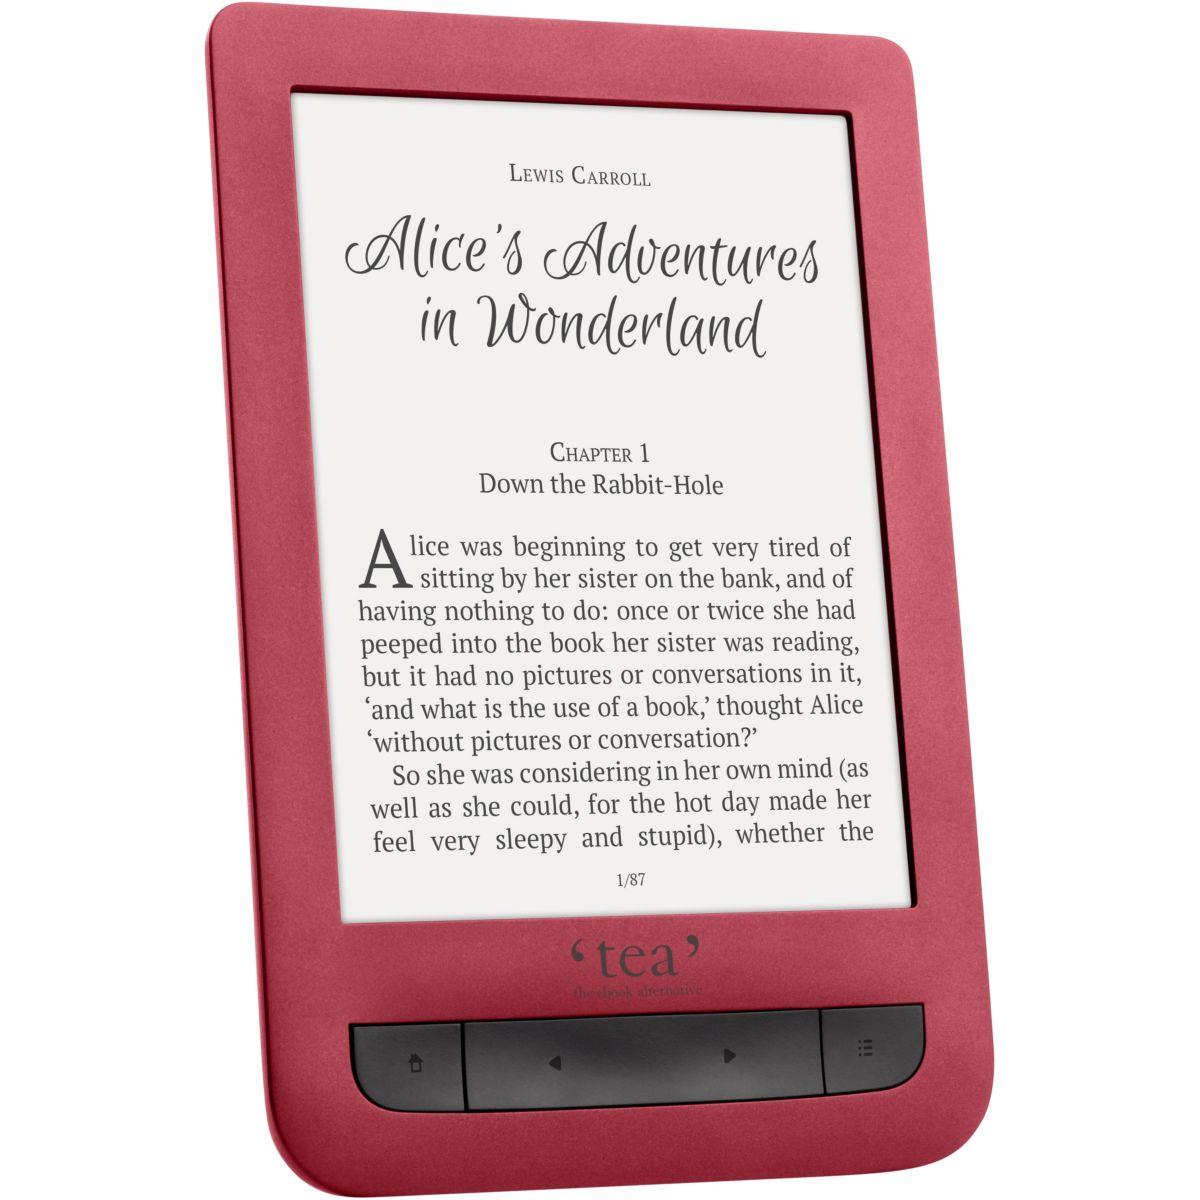 e-Book TEA Touch Lux 3 (photo)